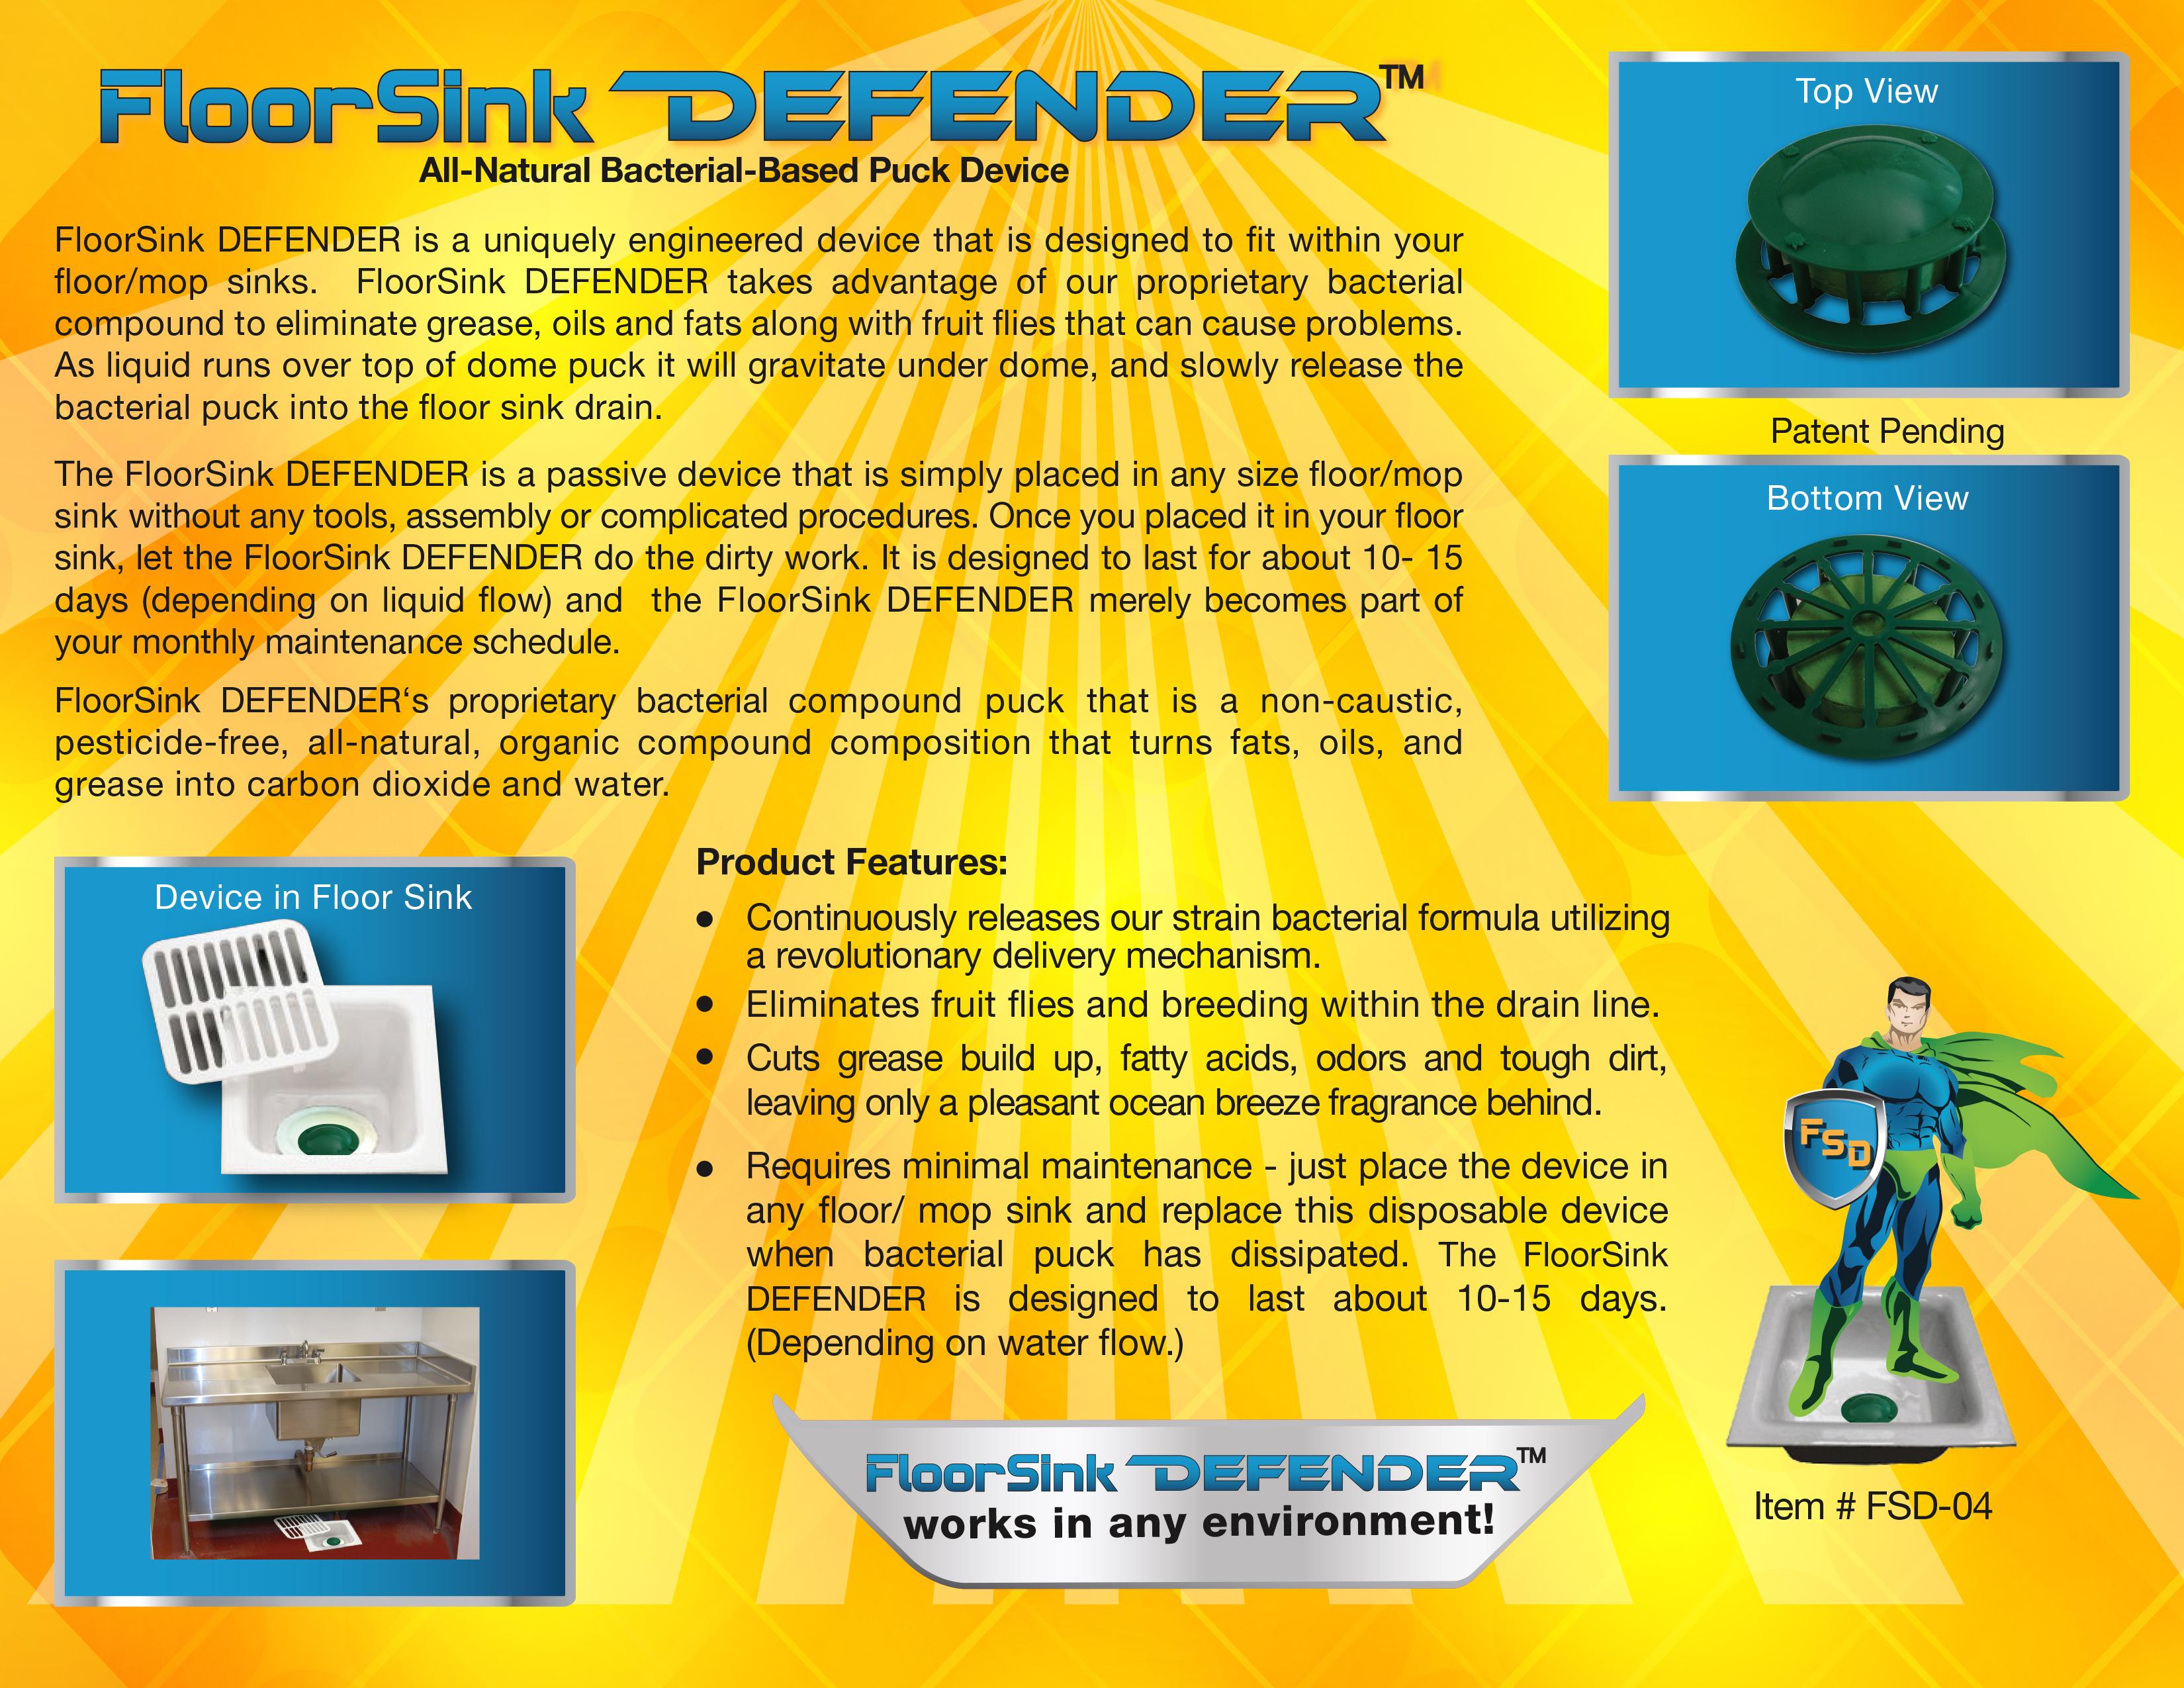 Floorsink Defender